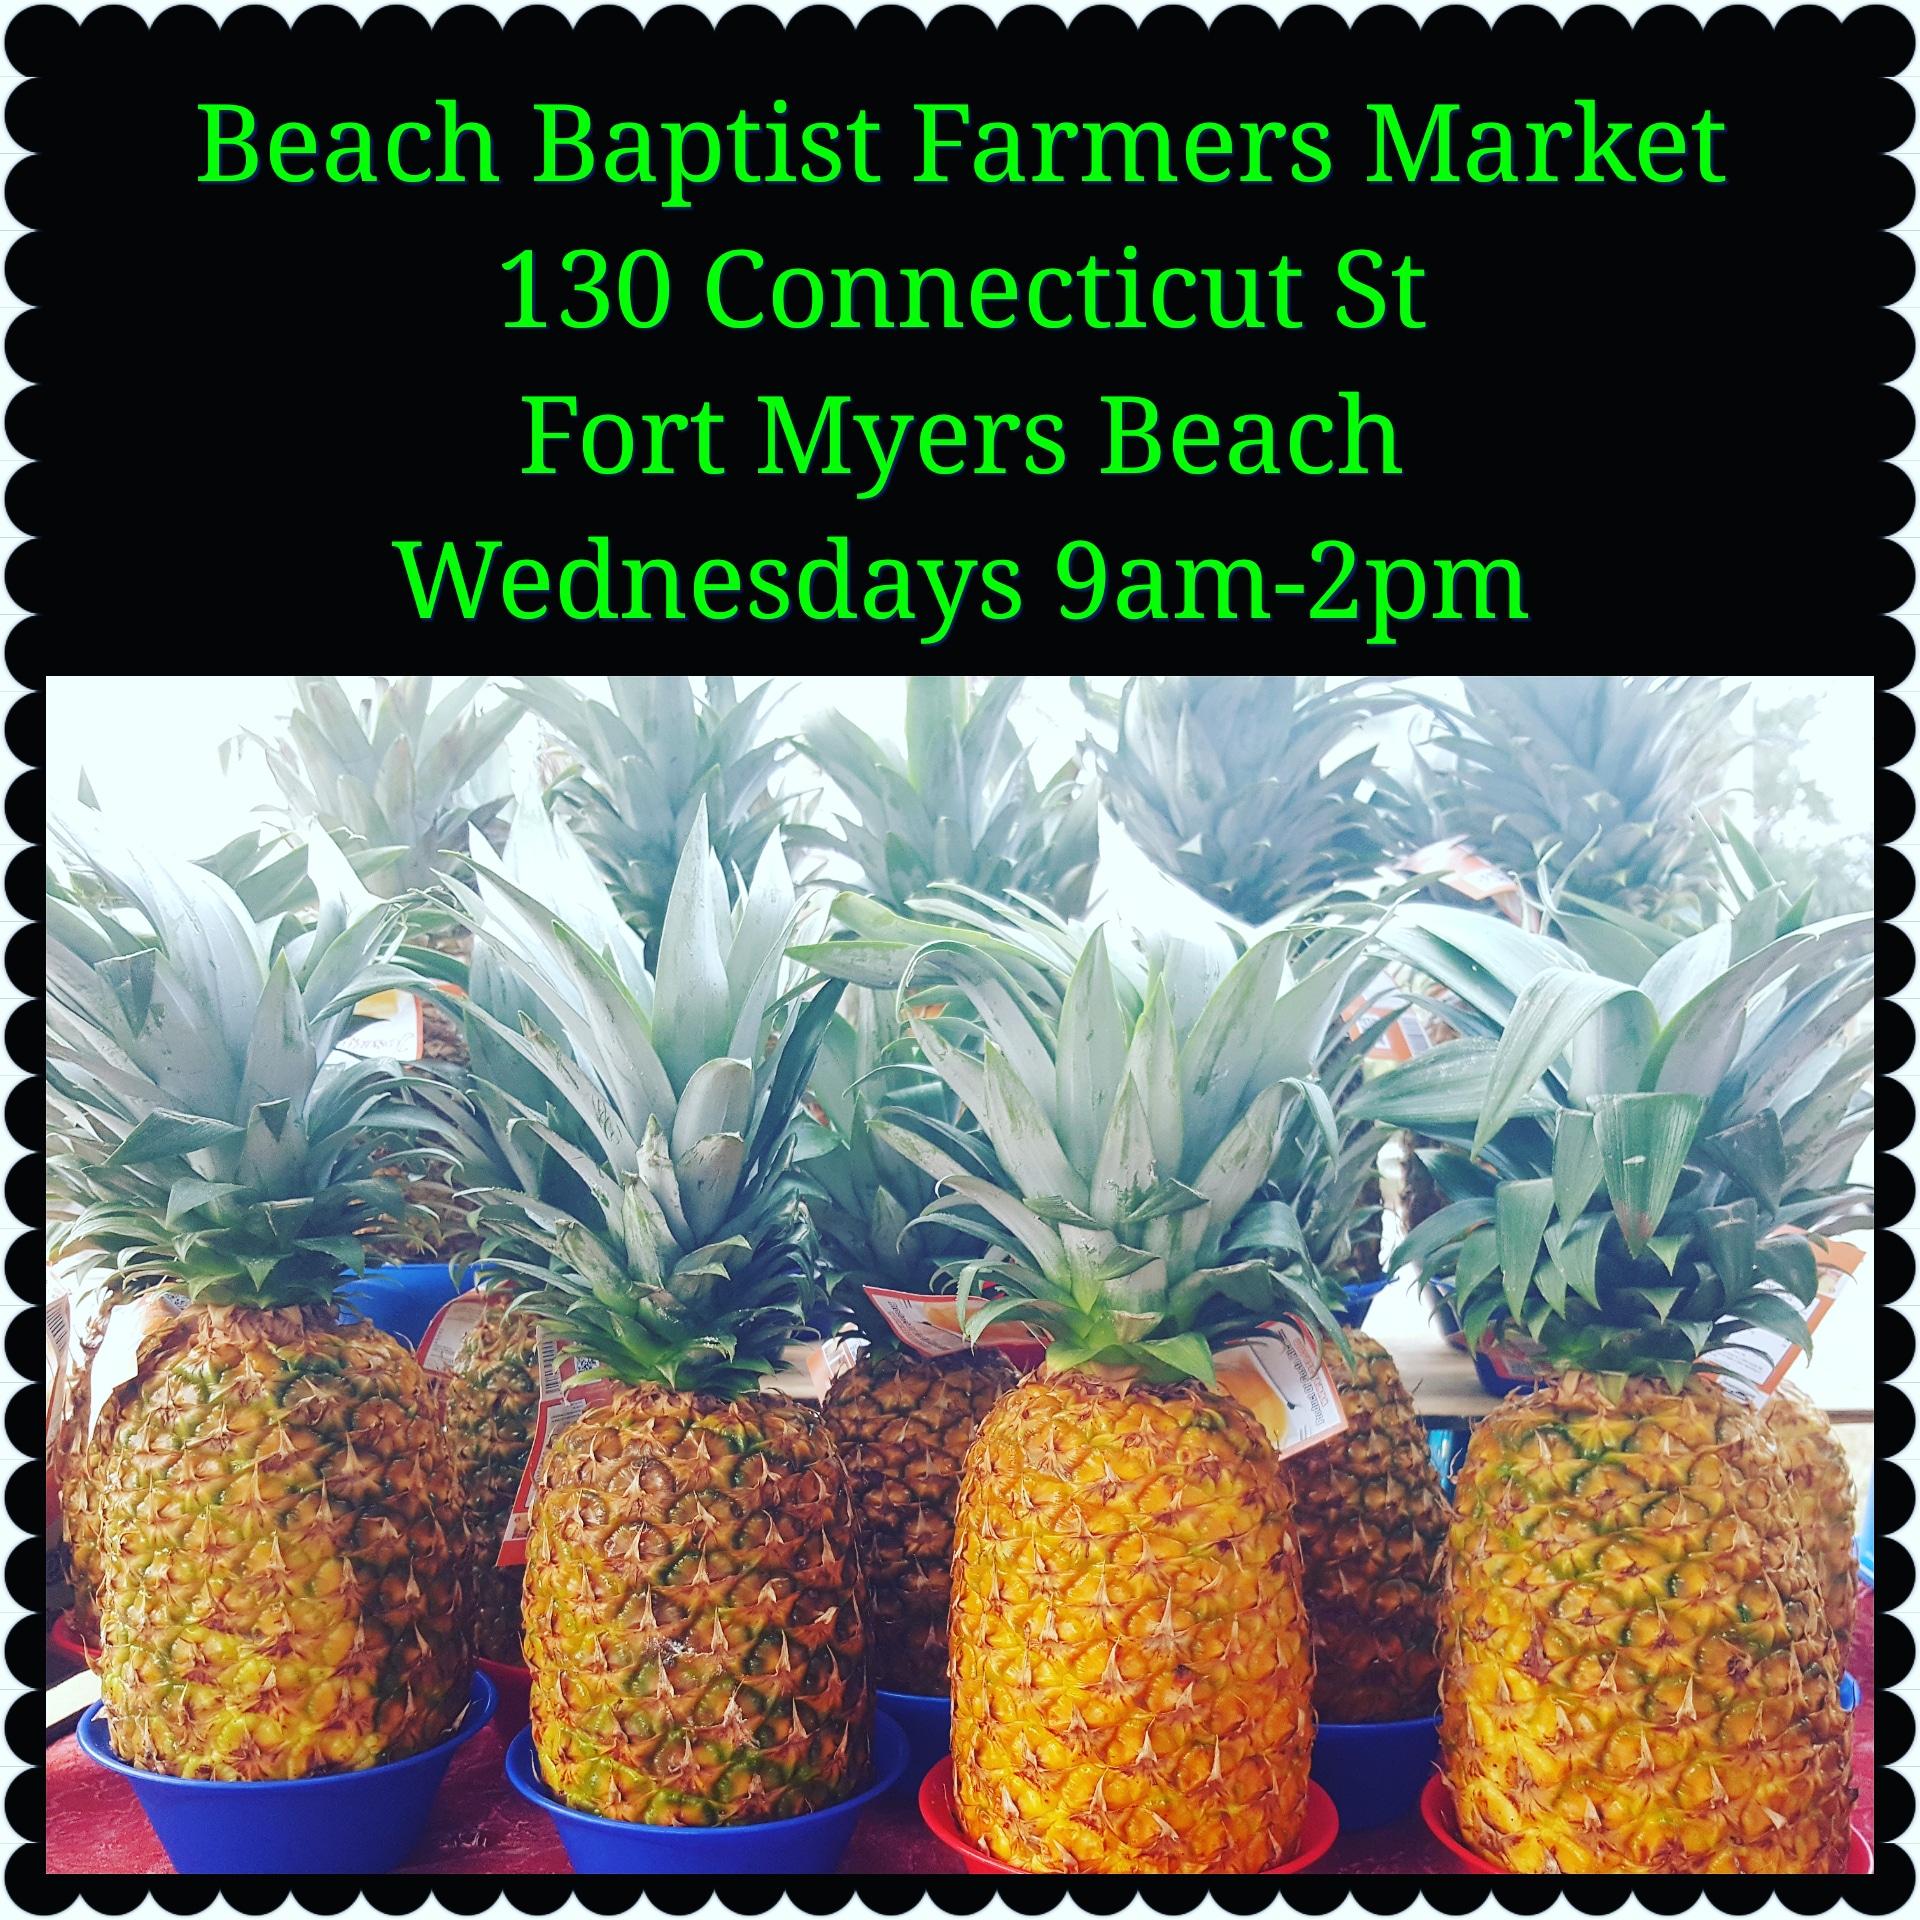 Beach Baptist Farmers Market